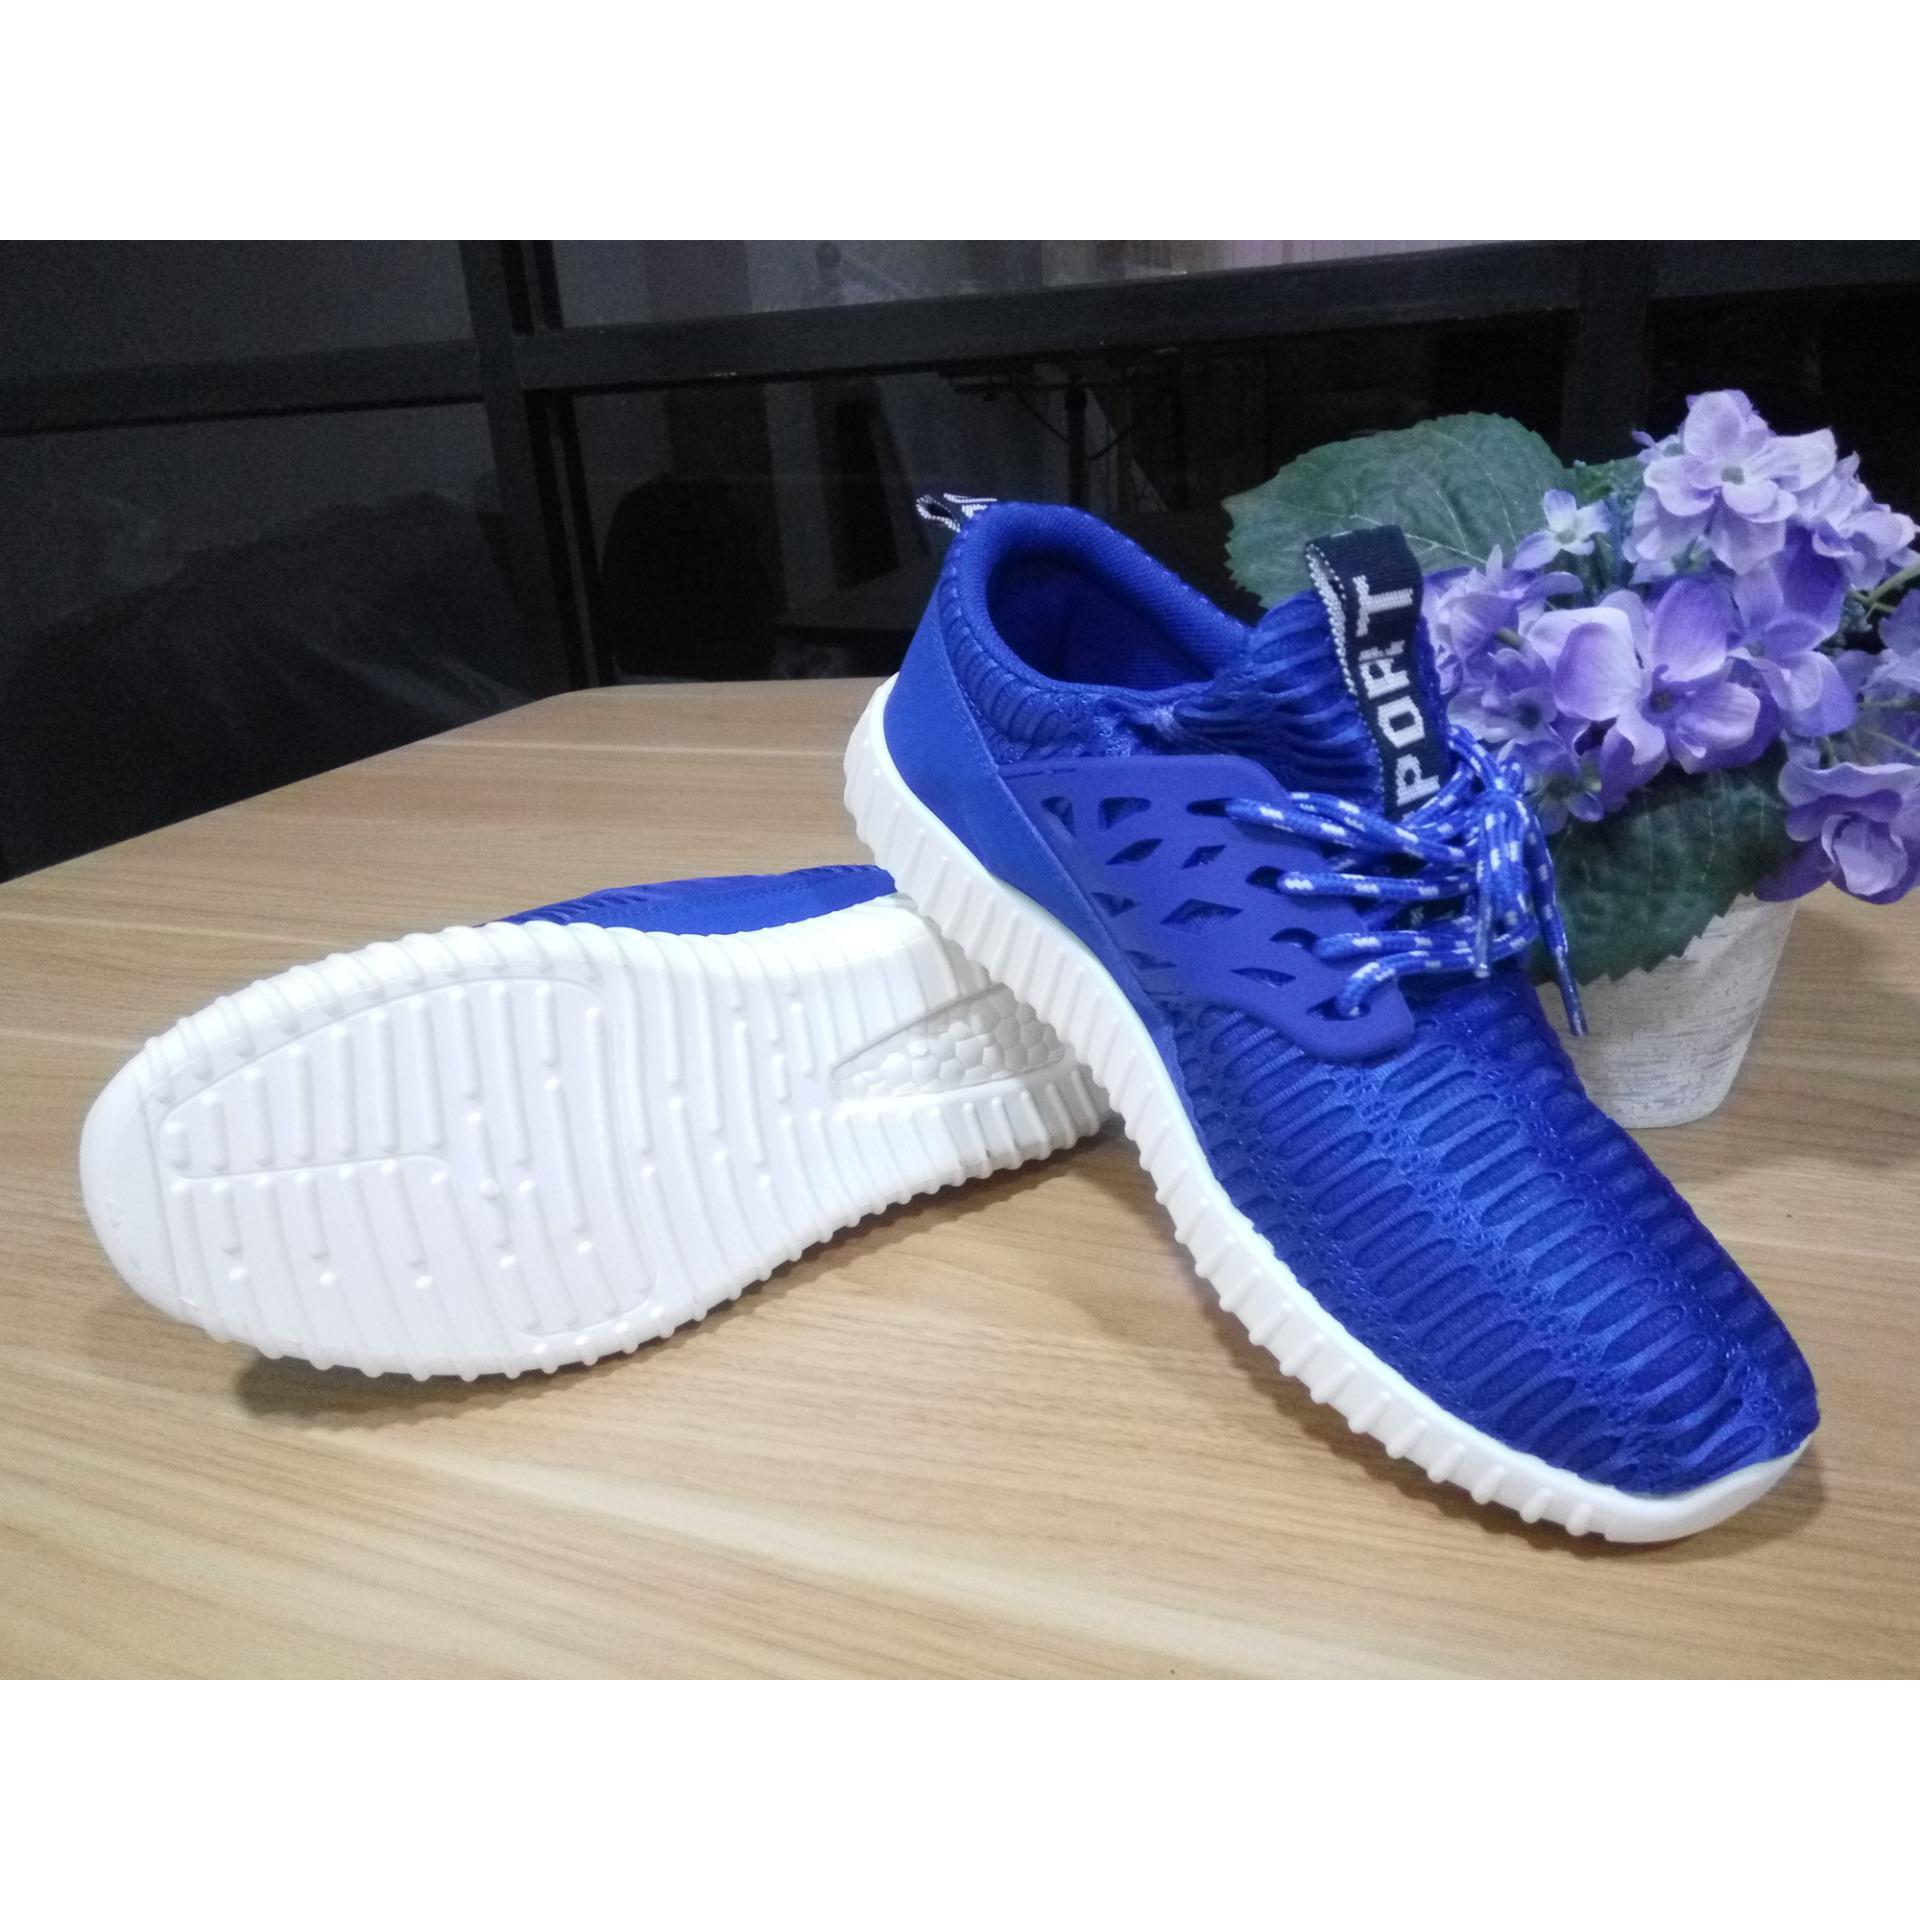 Diskon Sneakers Pria Import Korea Blue Branded